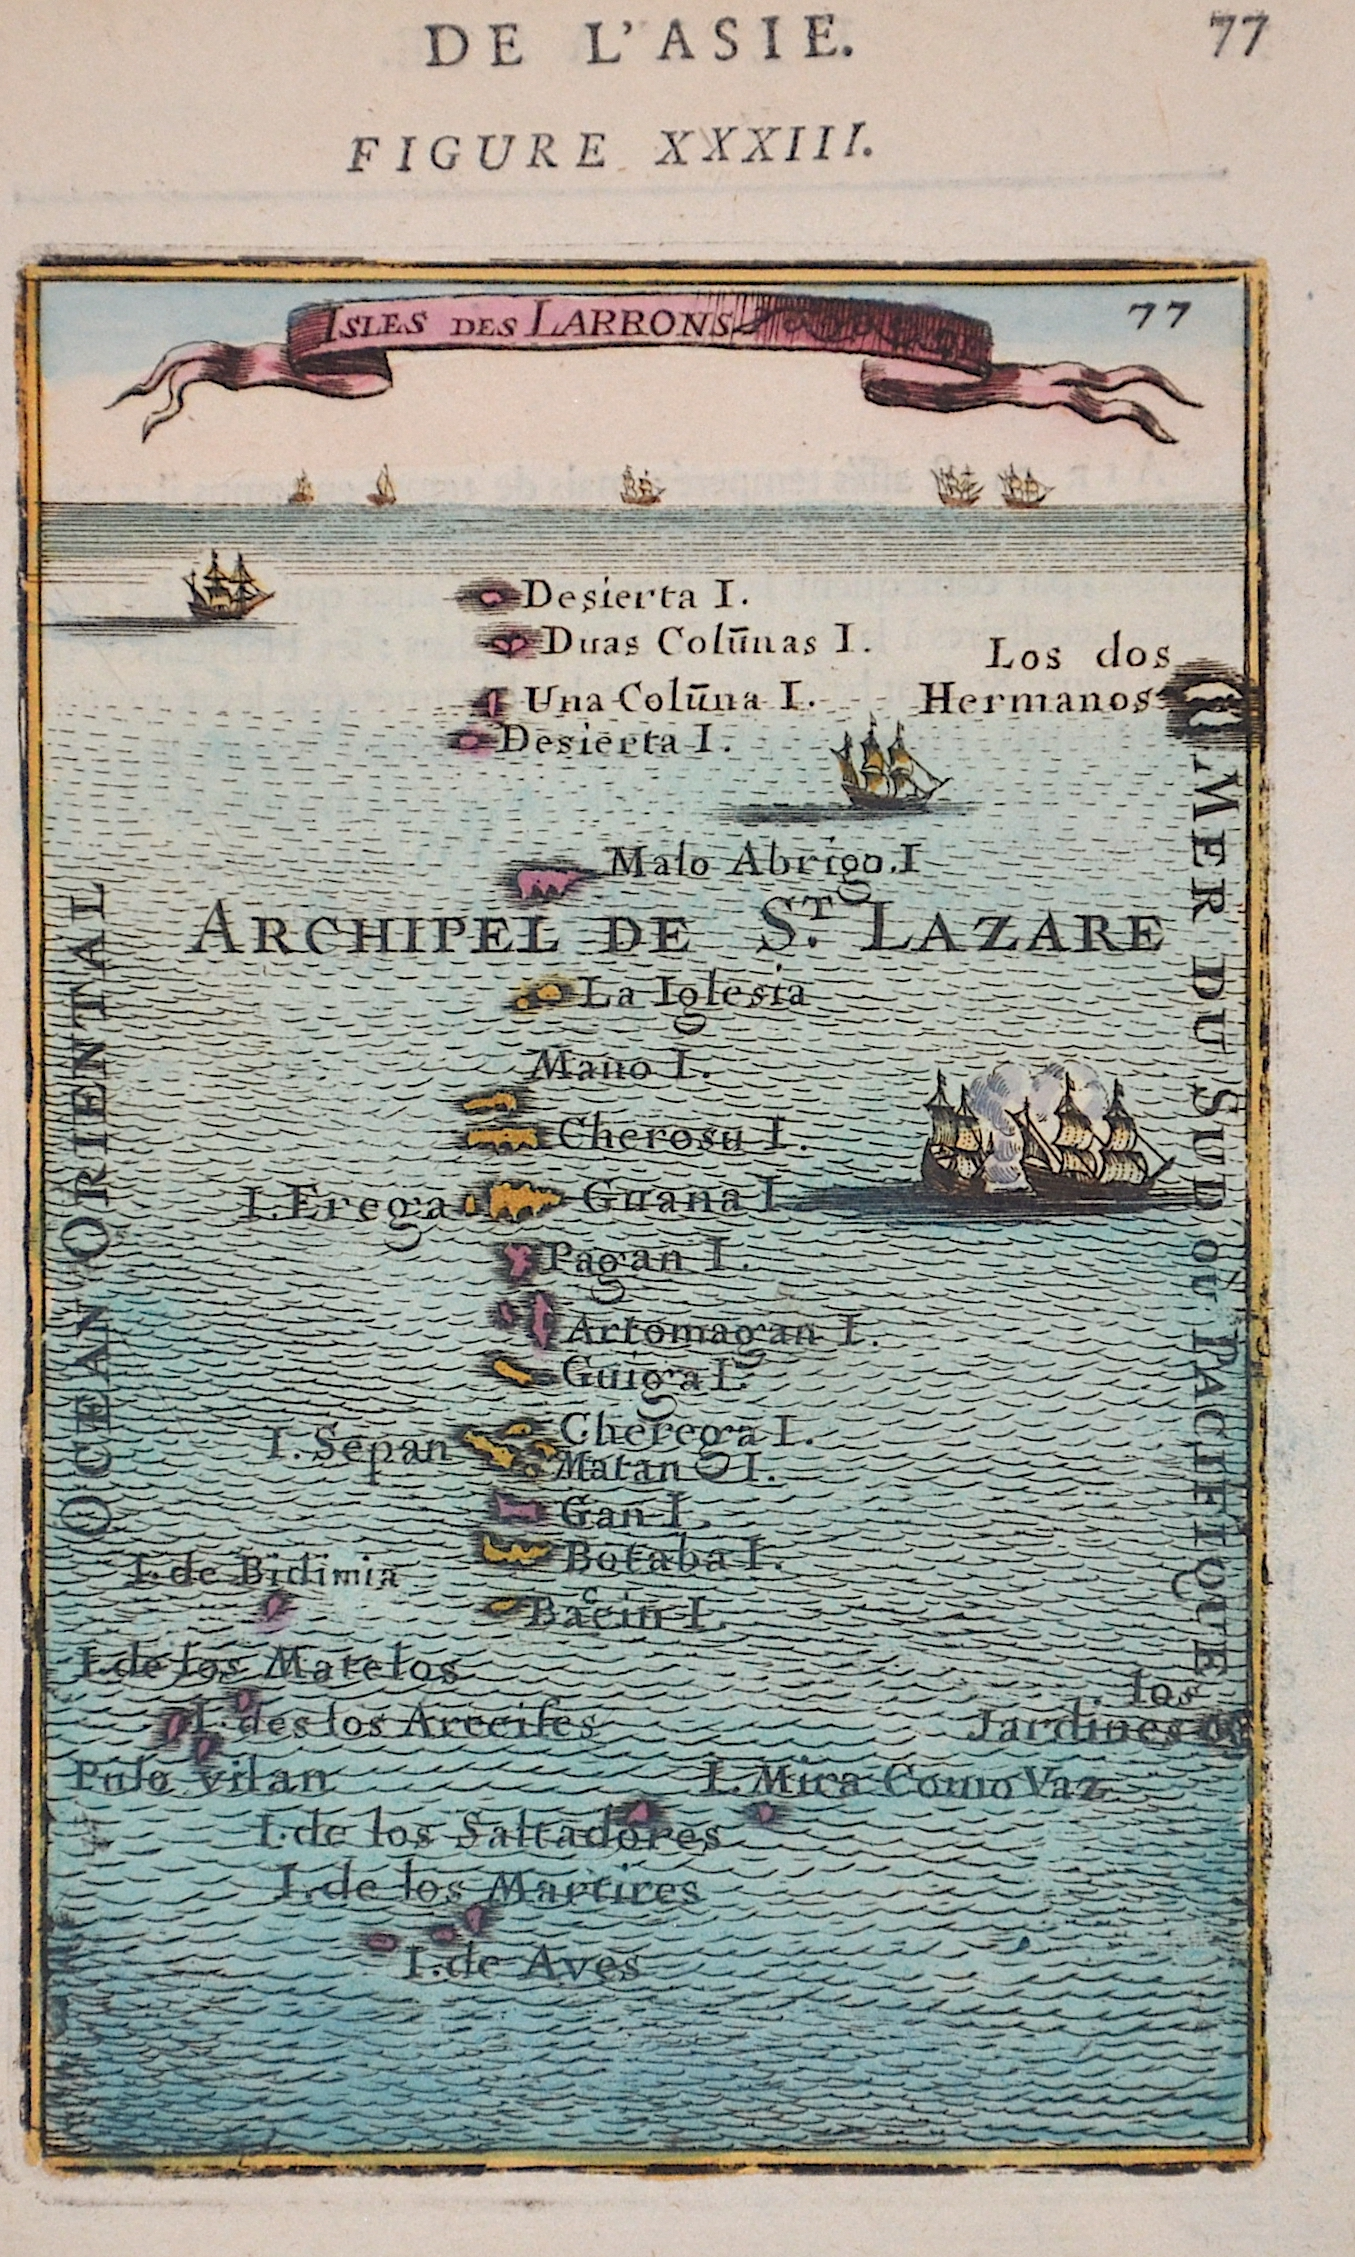 Mallet  Isles des Larrons